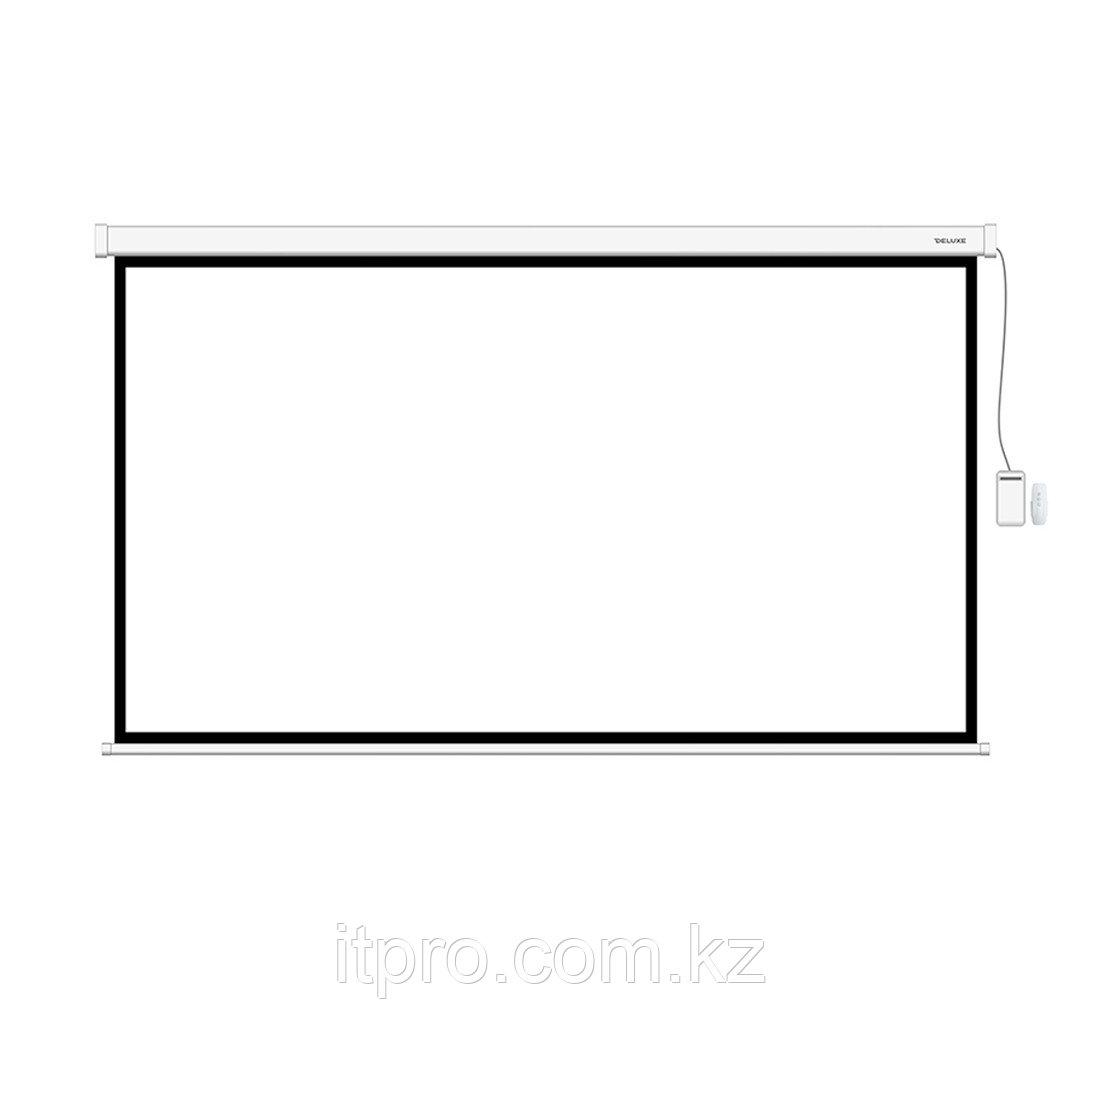 Экран моторизированный Deluxe DLS-ERC350x270W